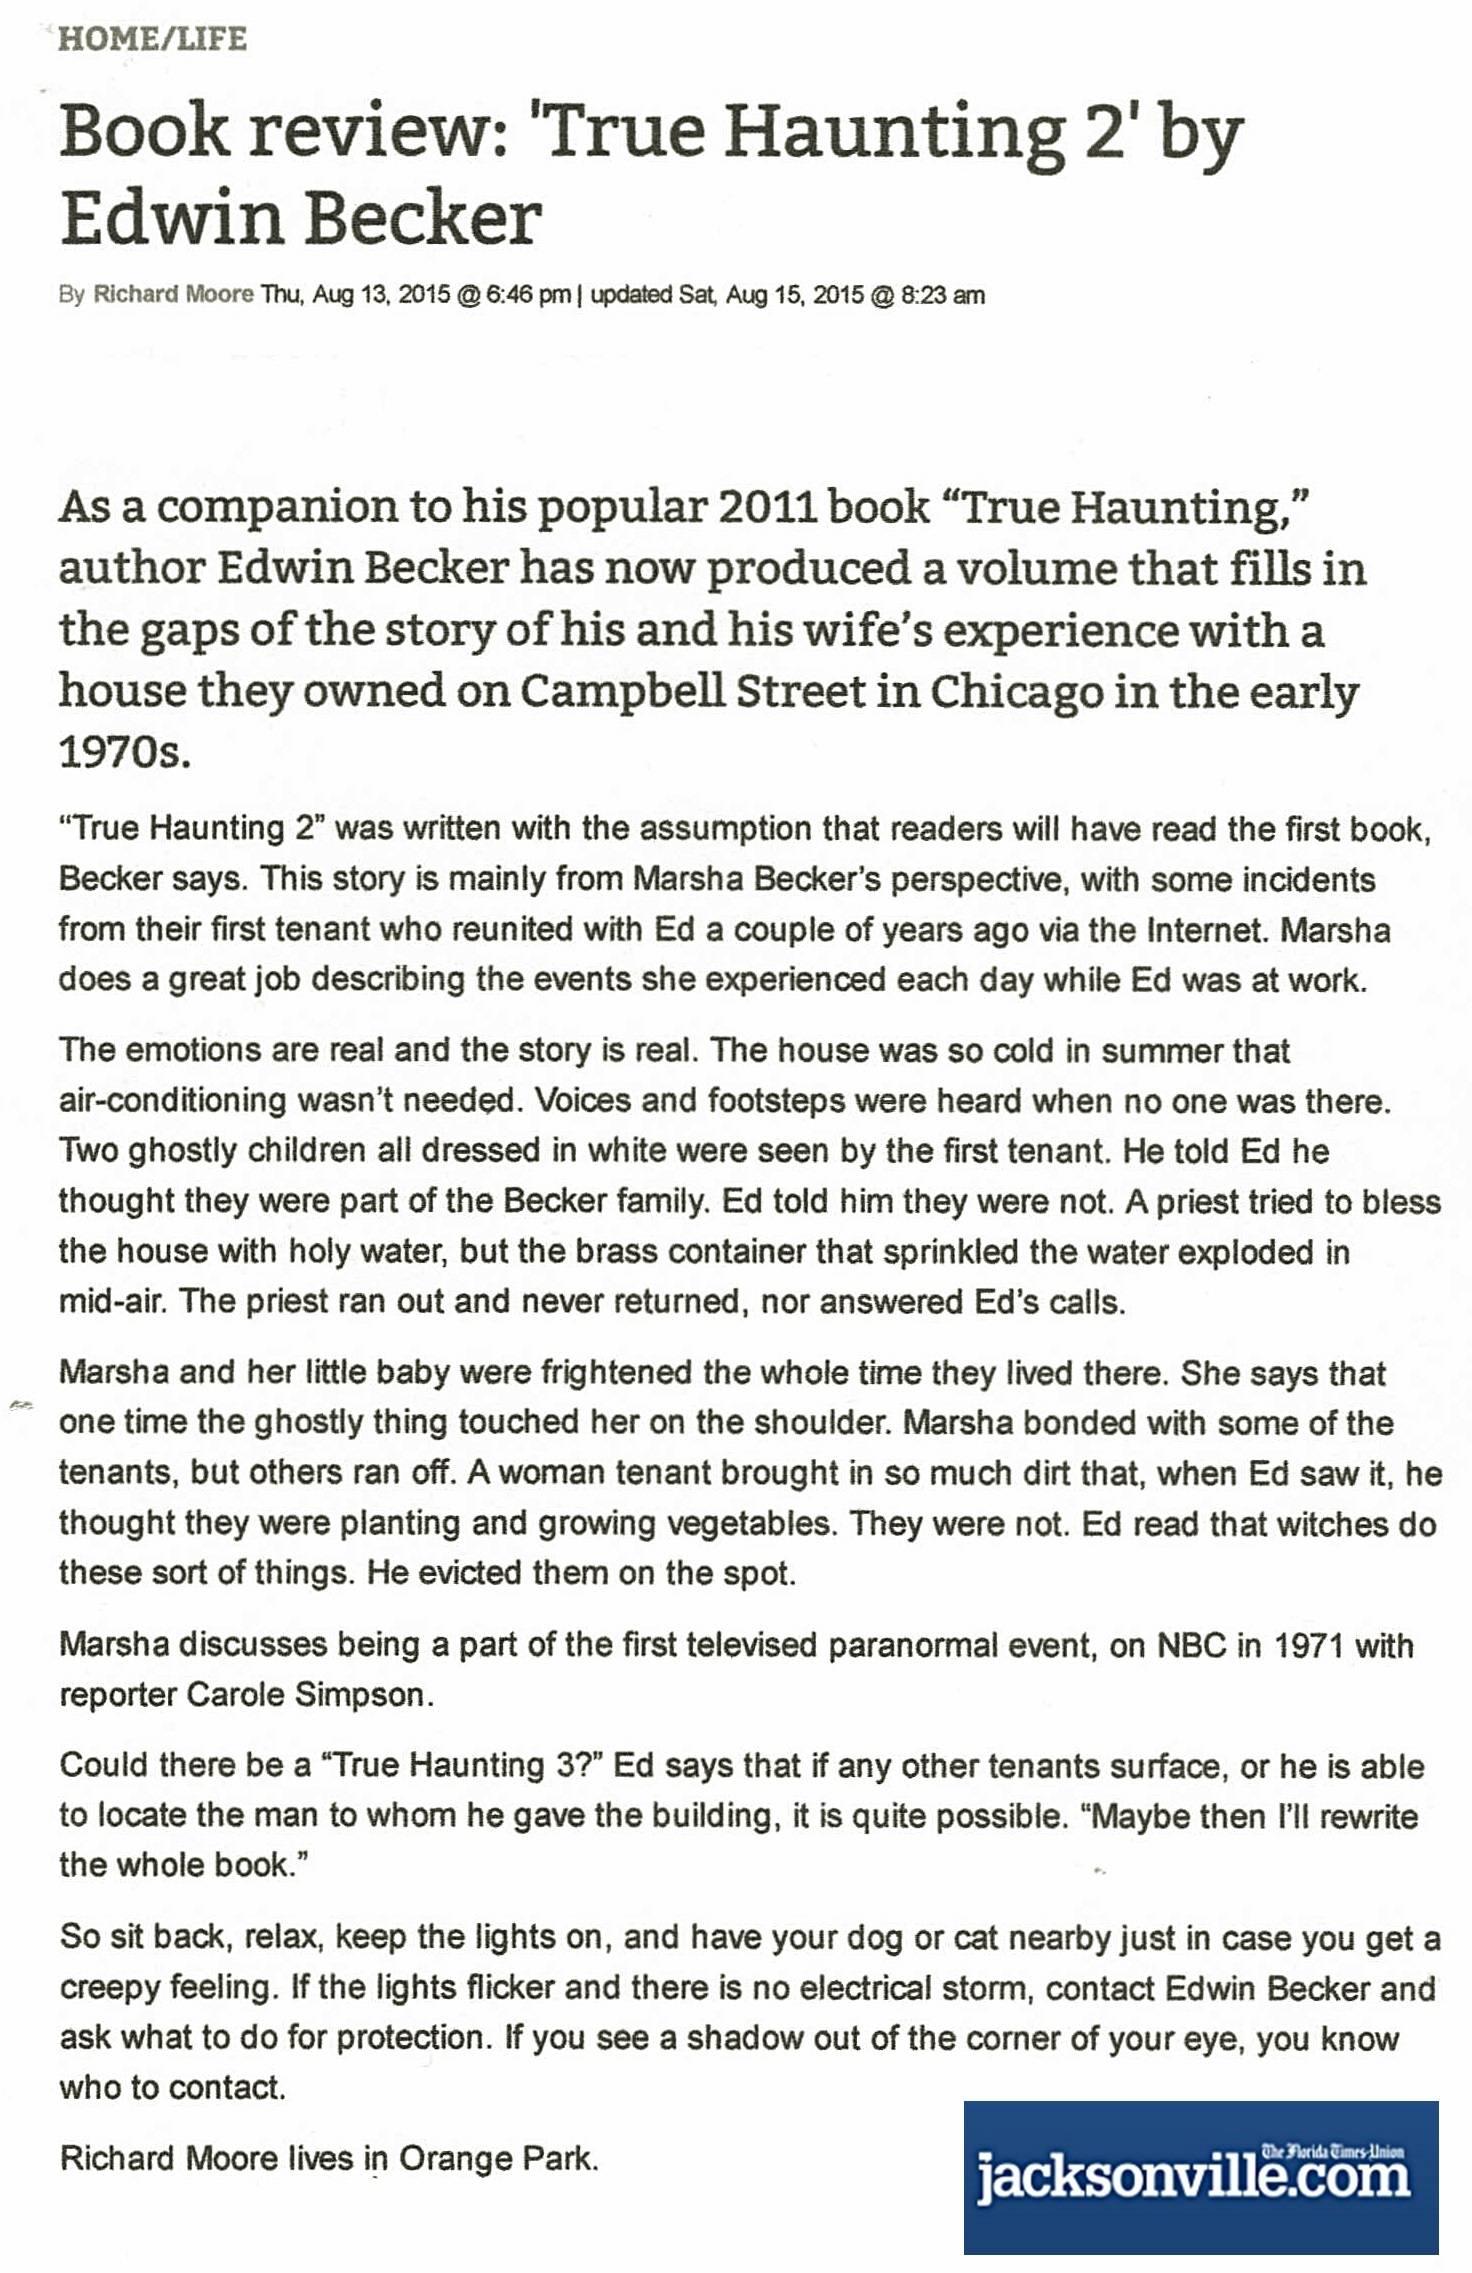 True HAunting 2, Florida review